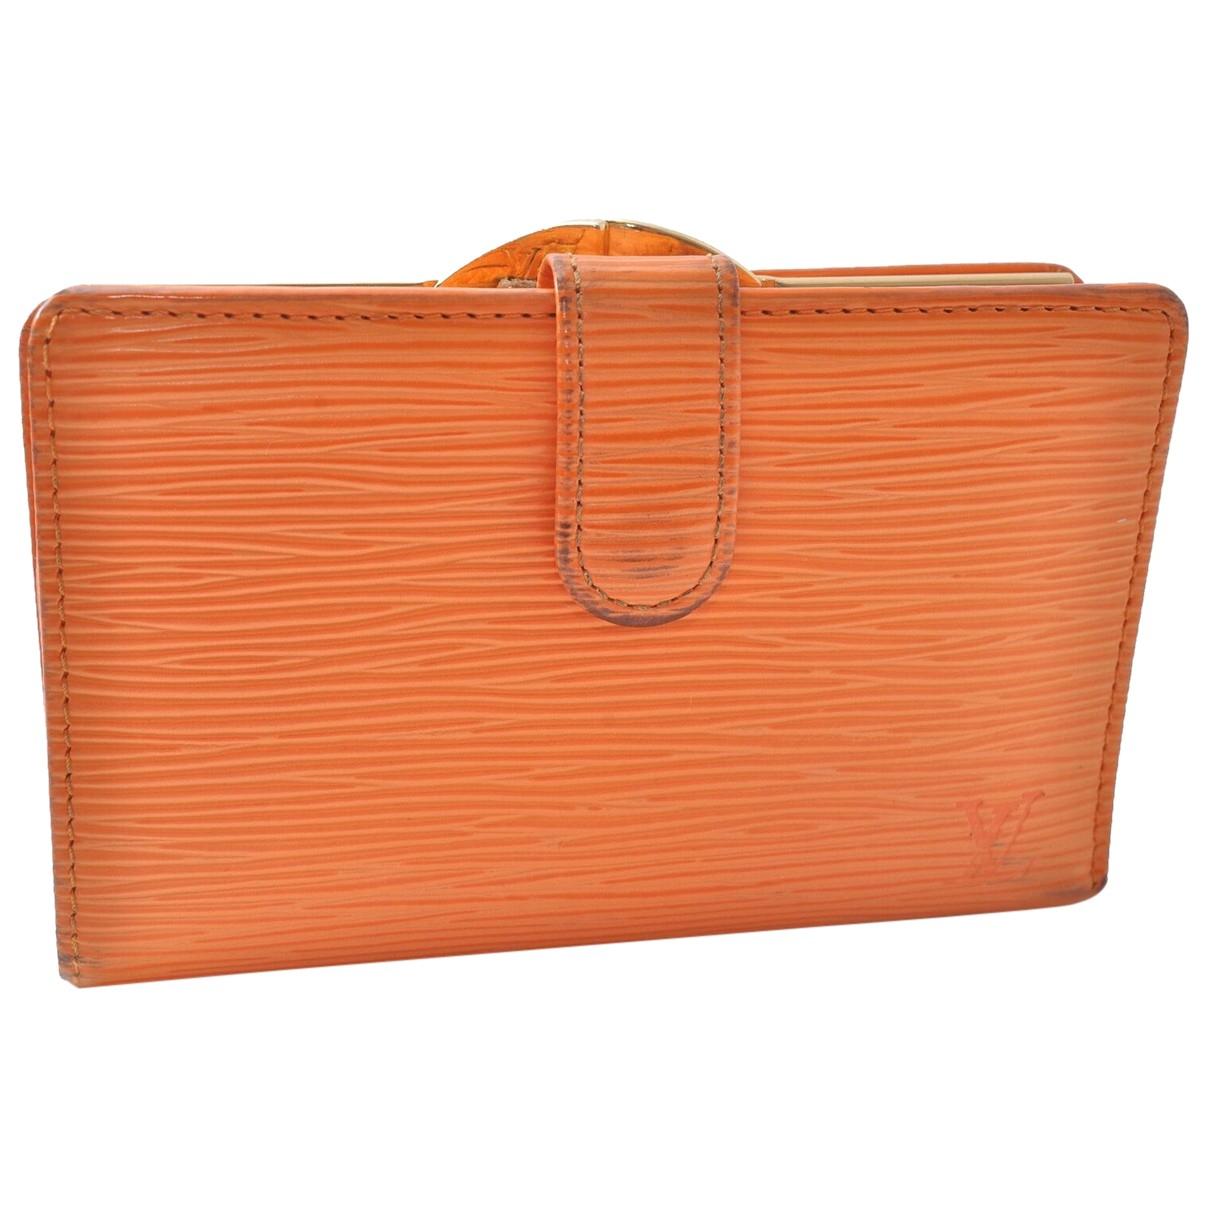 Louis Vuitton \N Portemonnaie in  Orange Leder